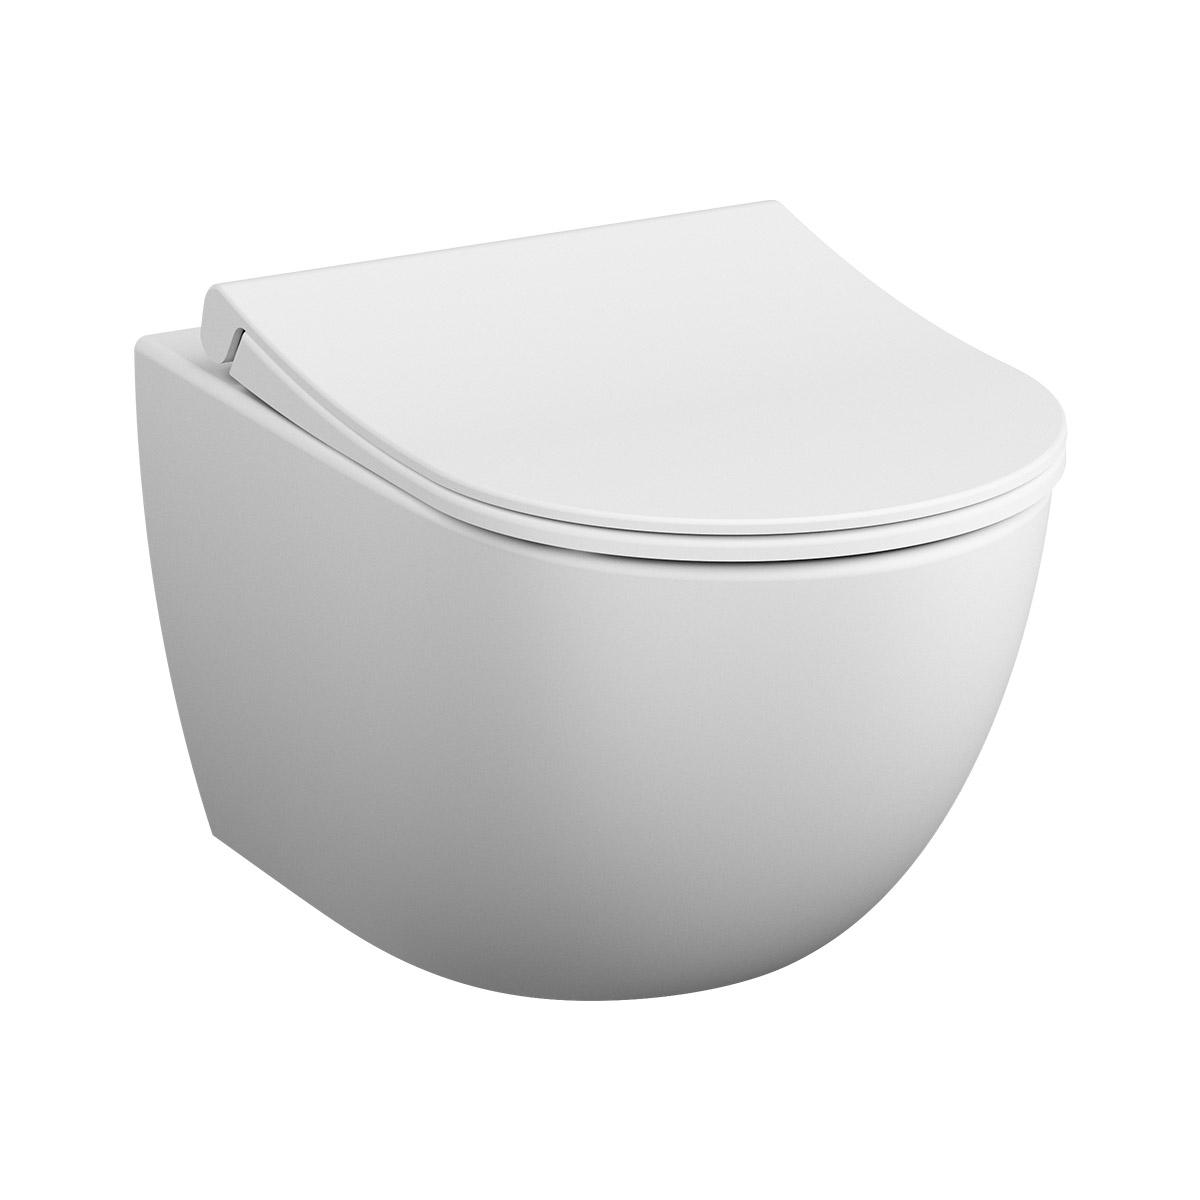 Sento Wand-WC VitrA Flush 2.0 mit Bidetfunktion, Edelweiß